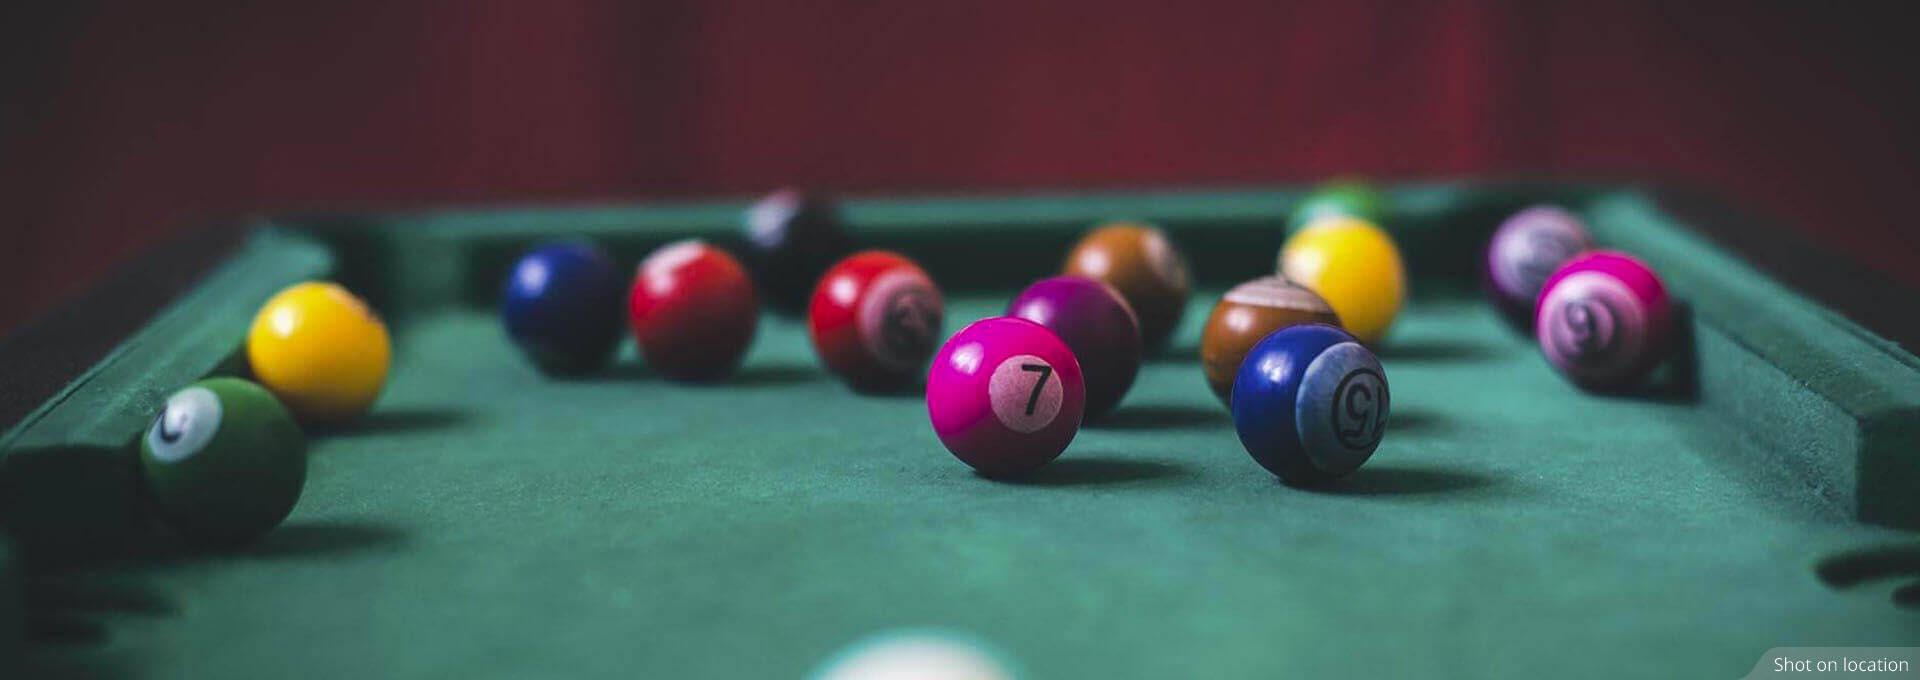 Pool Billiards in Calgary by House of Hiranandani in Devanahalli, Bengaluru